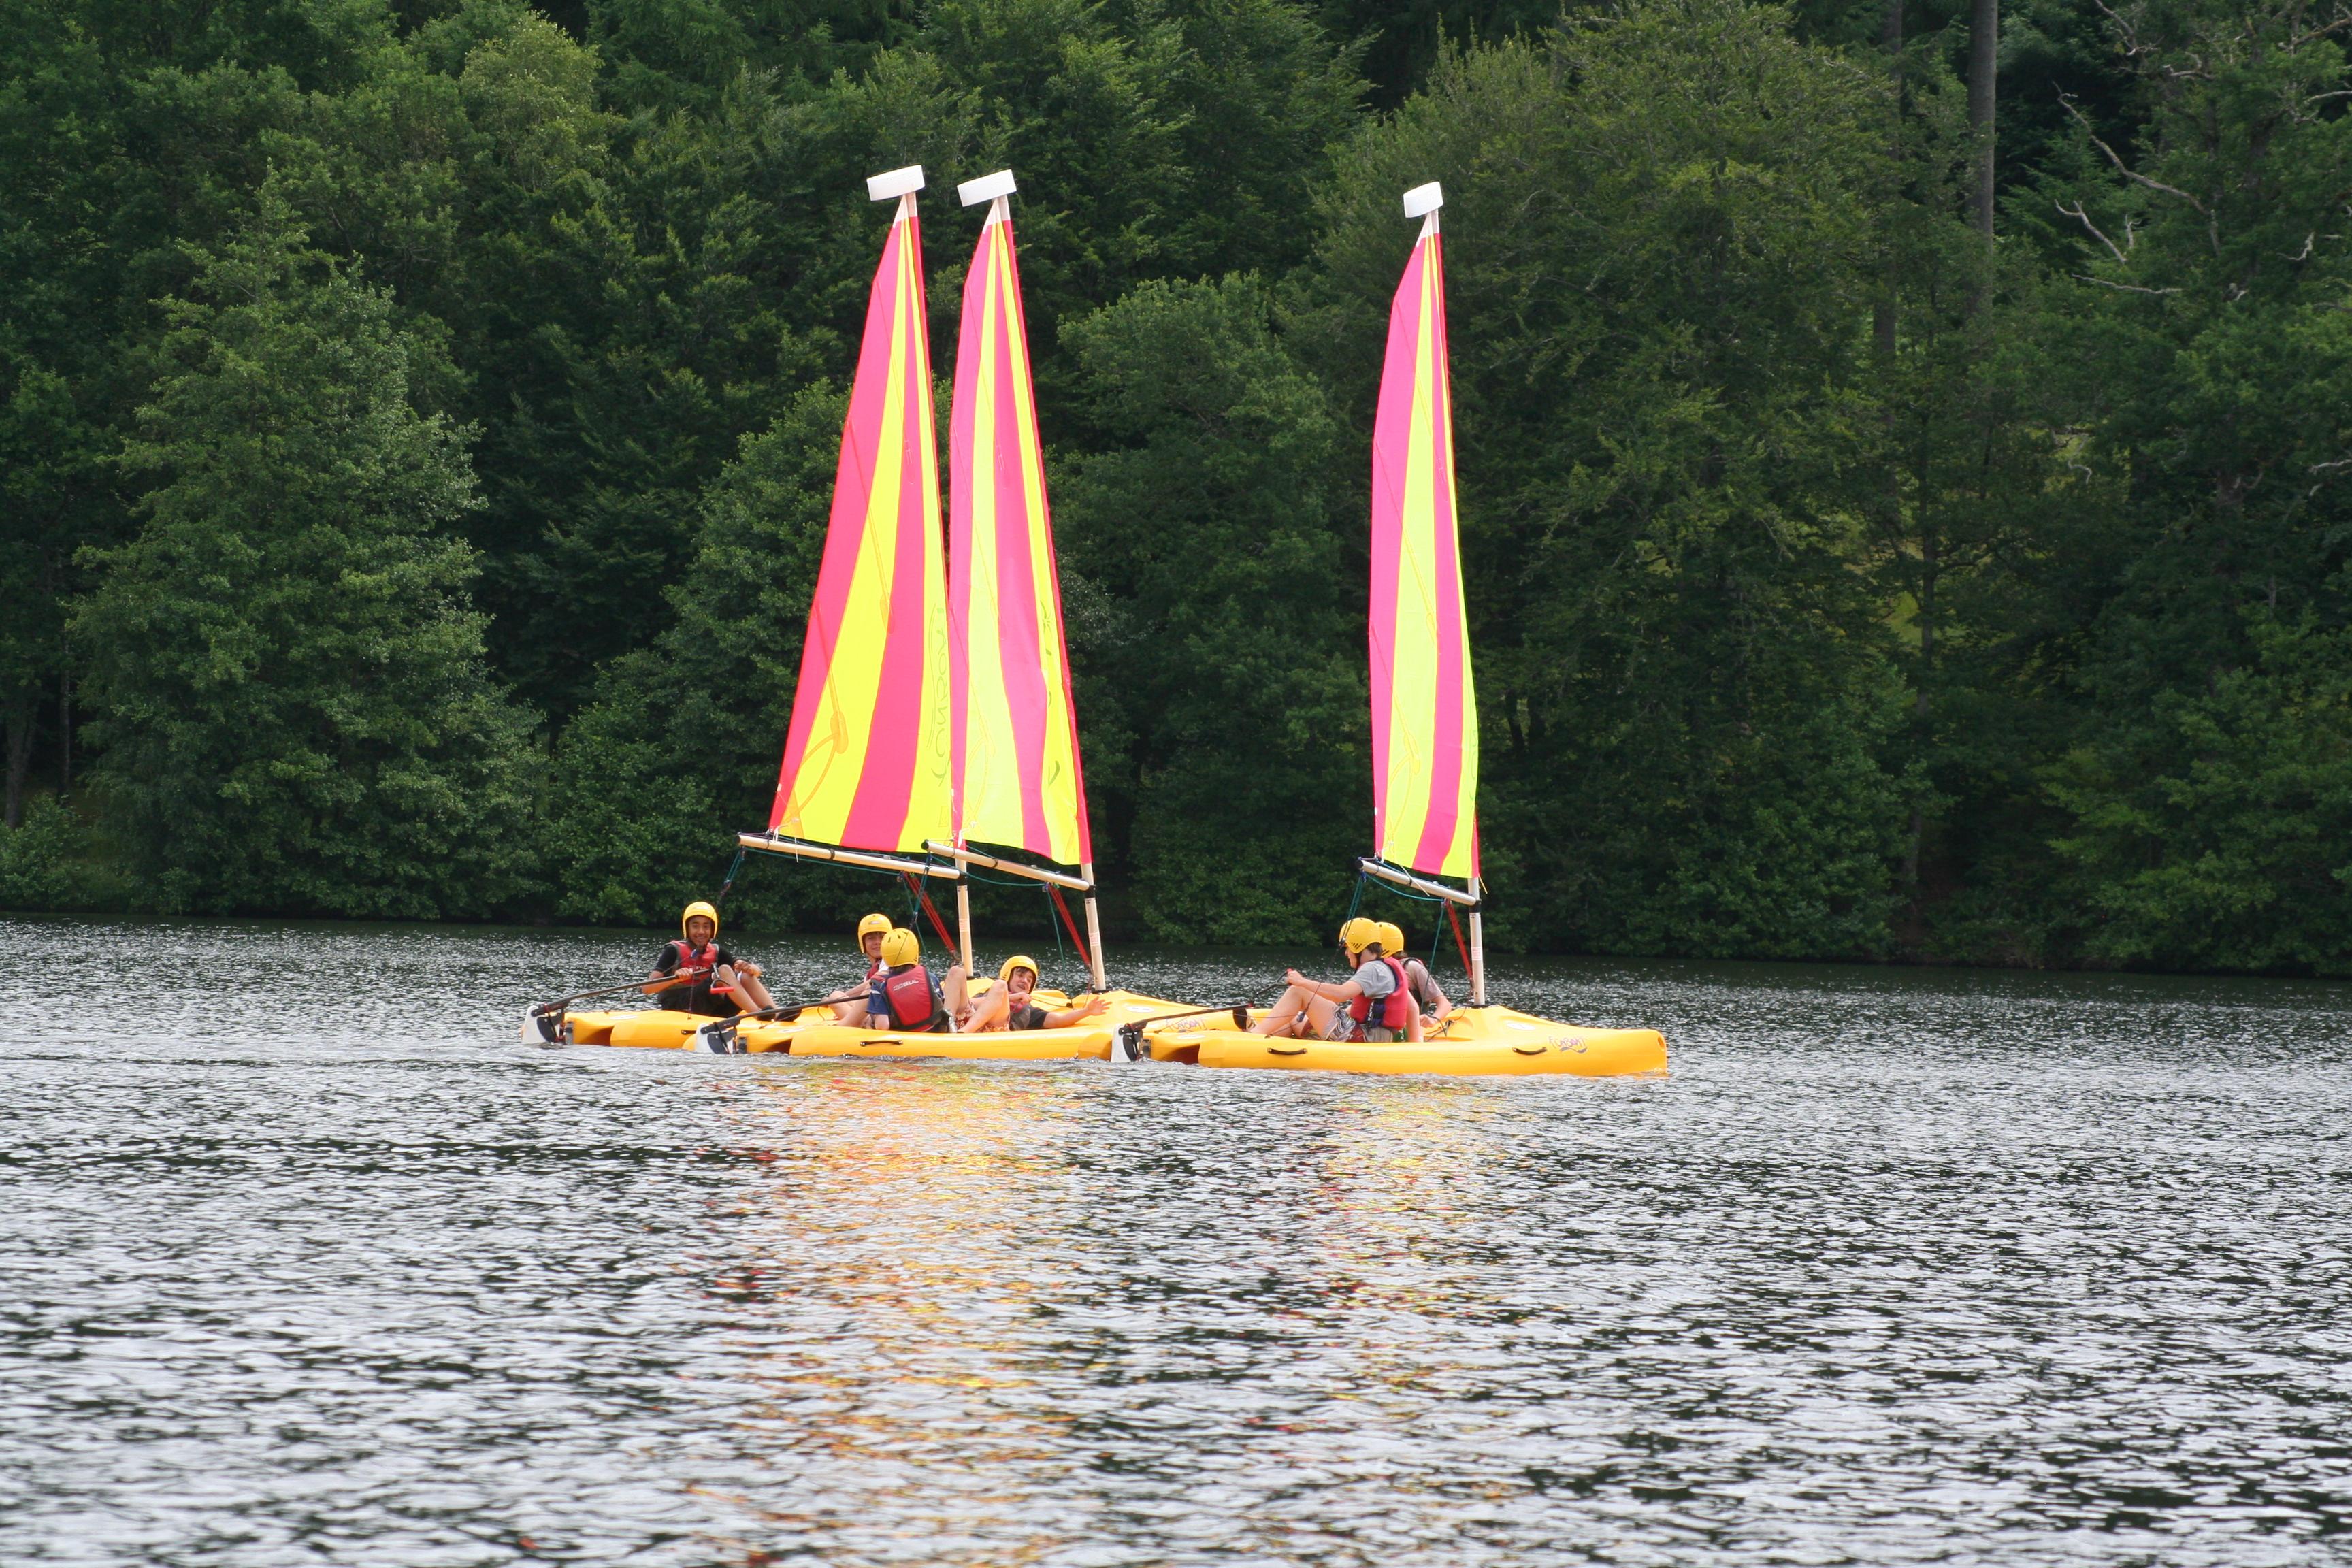 Sailing Funboats Lake Children Groups